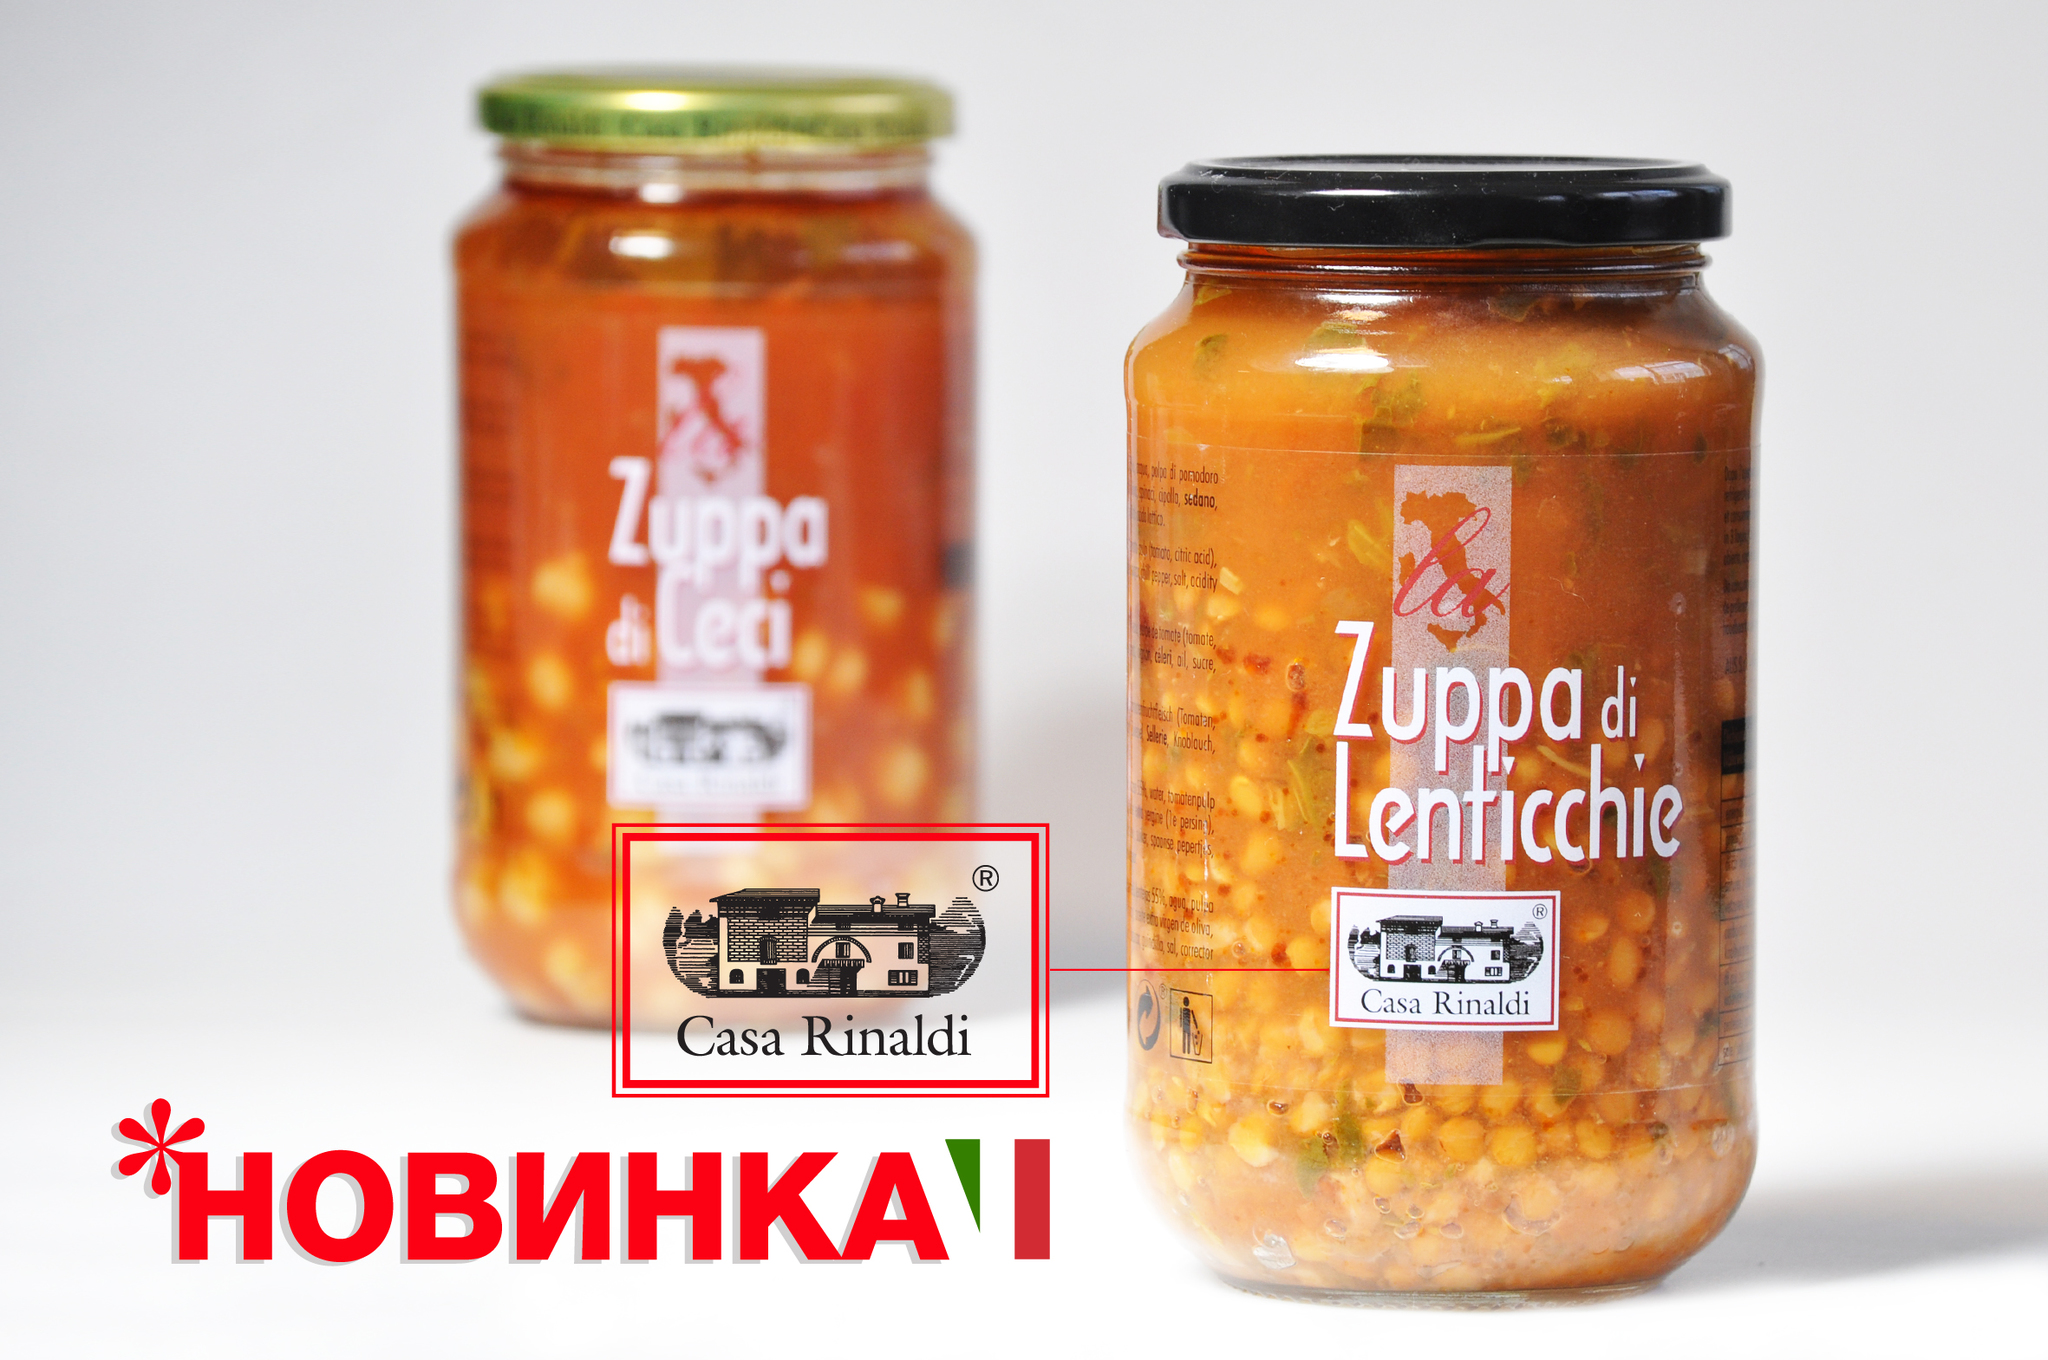 Суп из чечевицы Casa Rinaldi 550 г